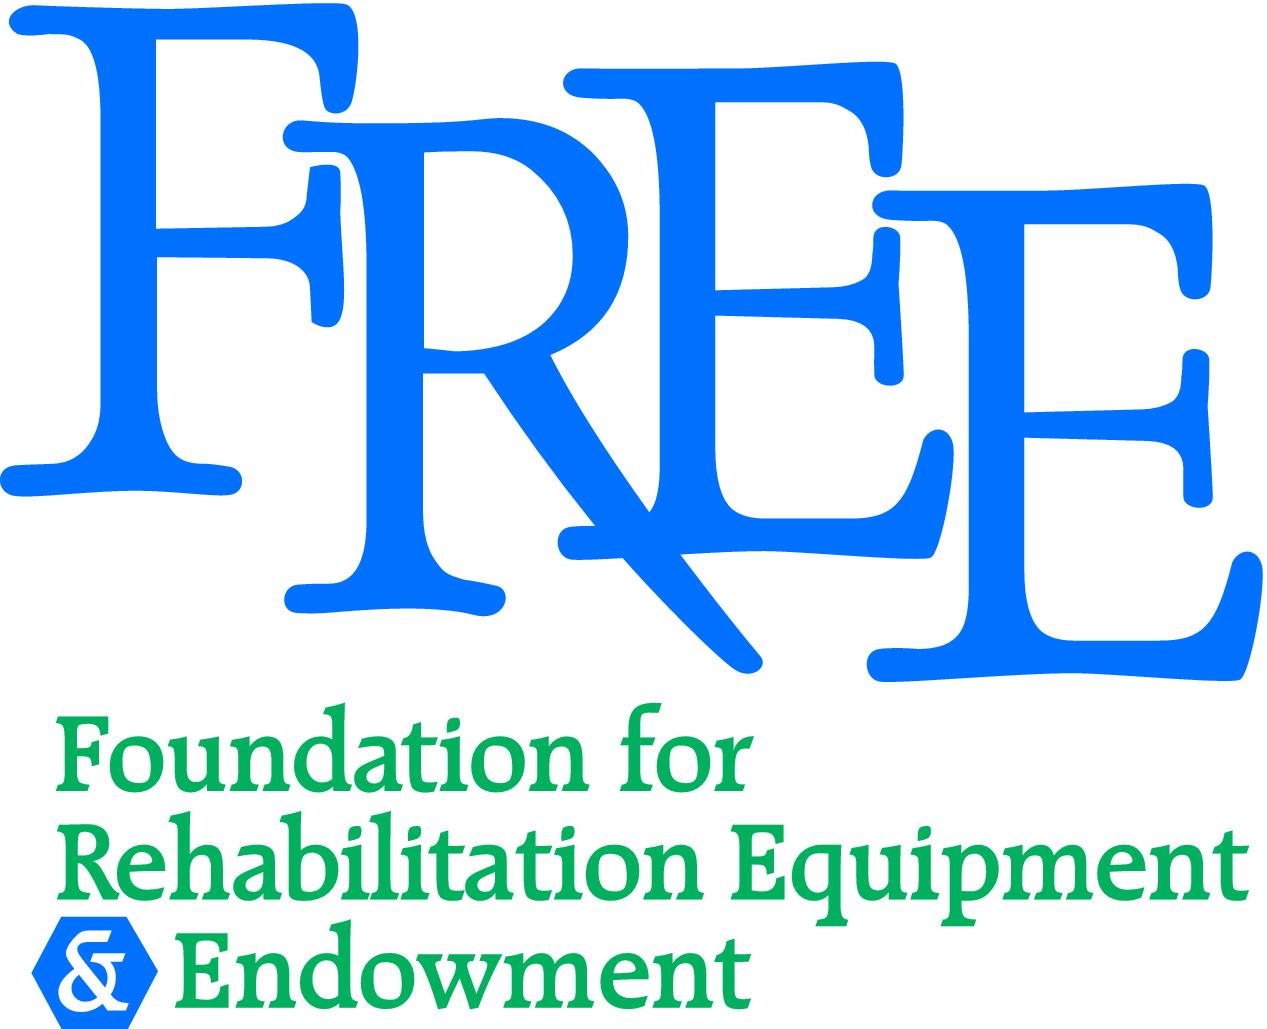 FREE logo on white backgroudn April 16 2014.jpg